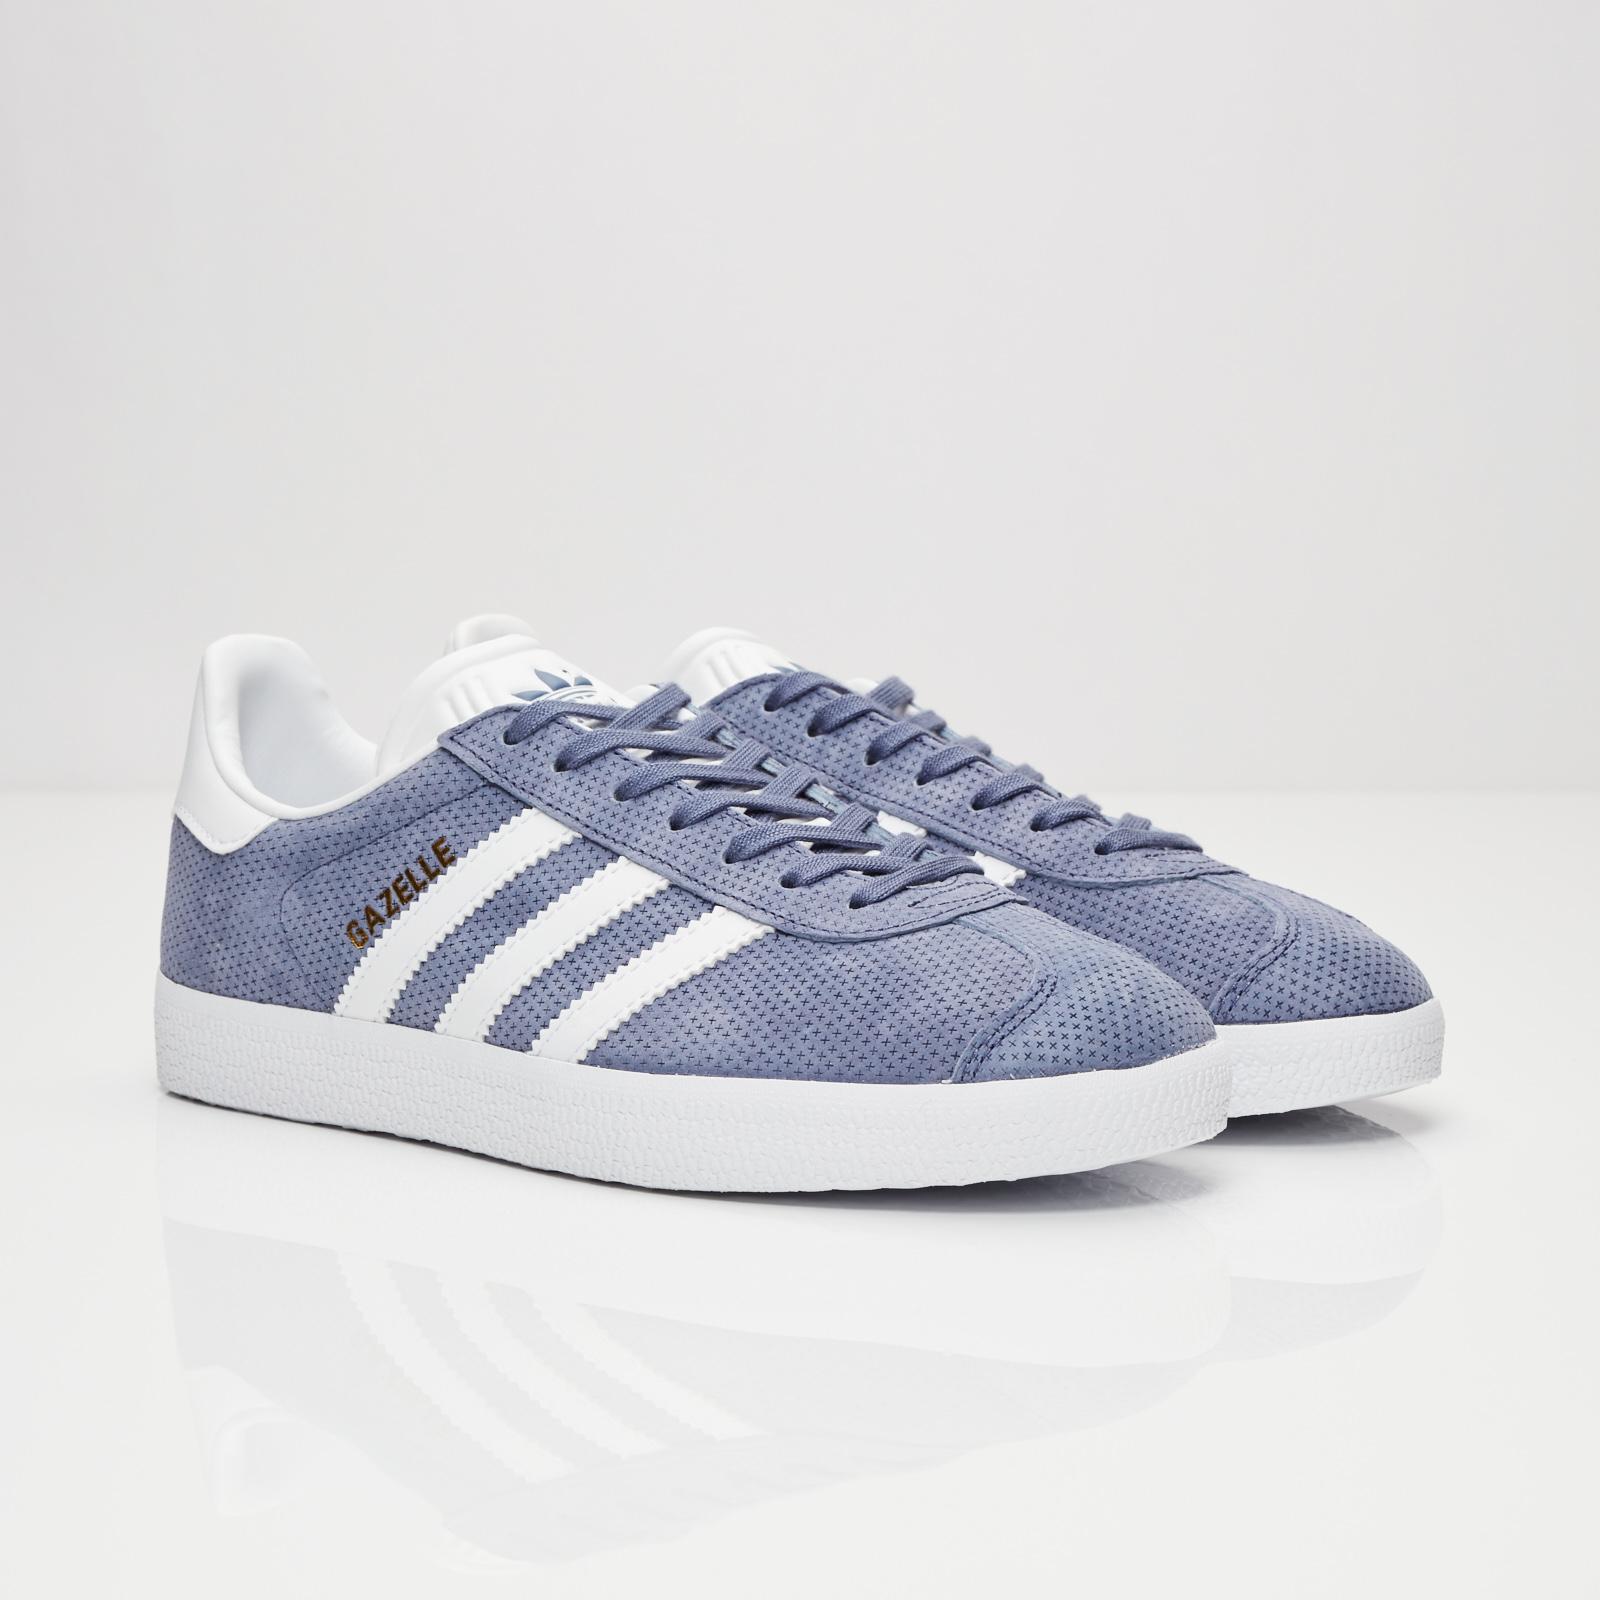 buy online 61d16 189d8 adidas Gazelle W